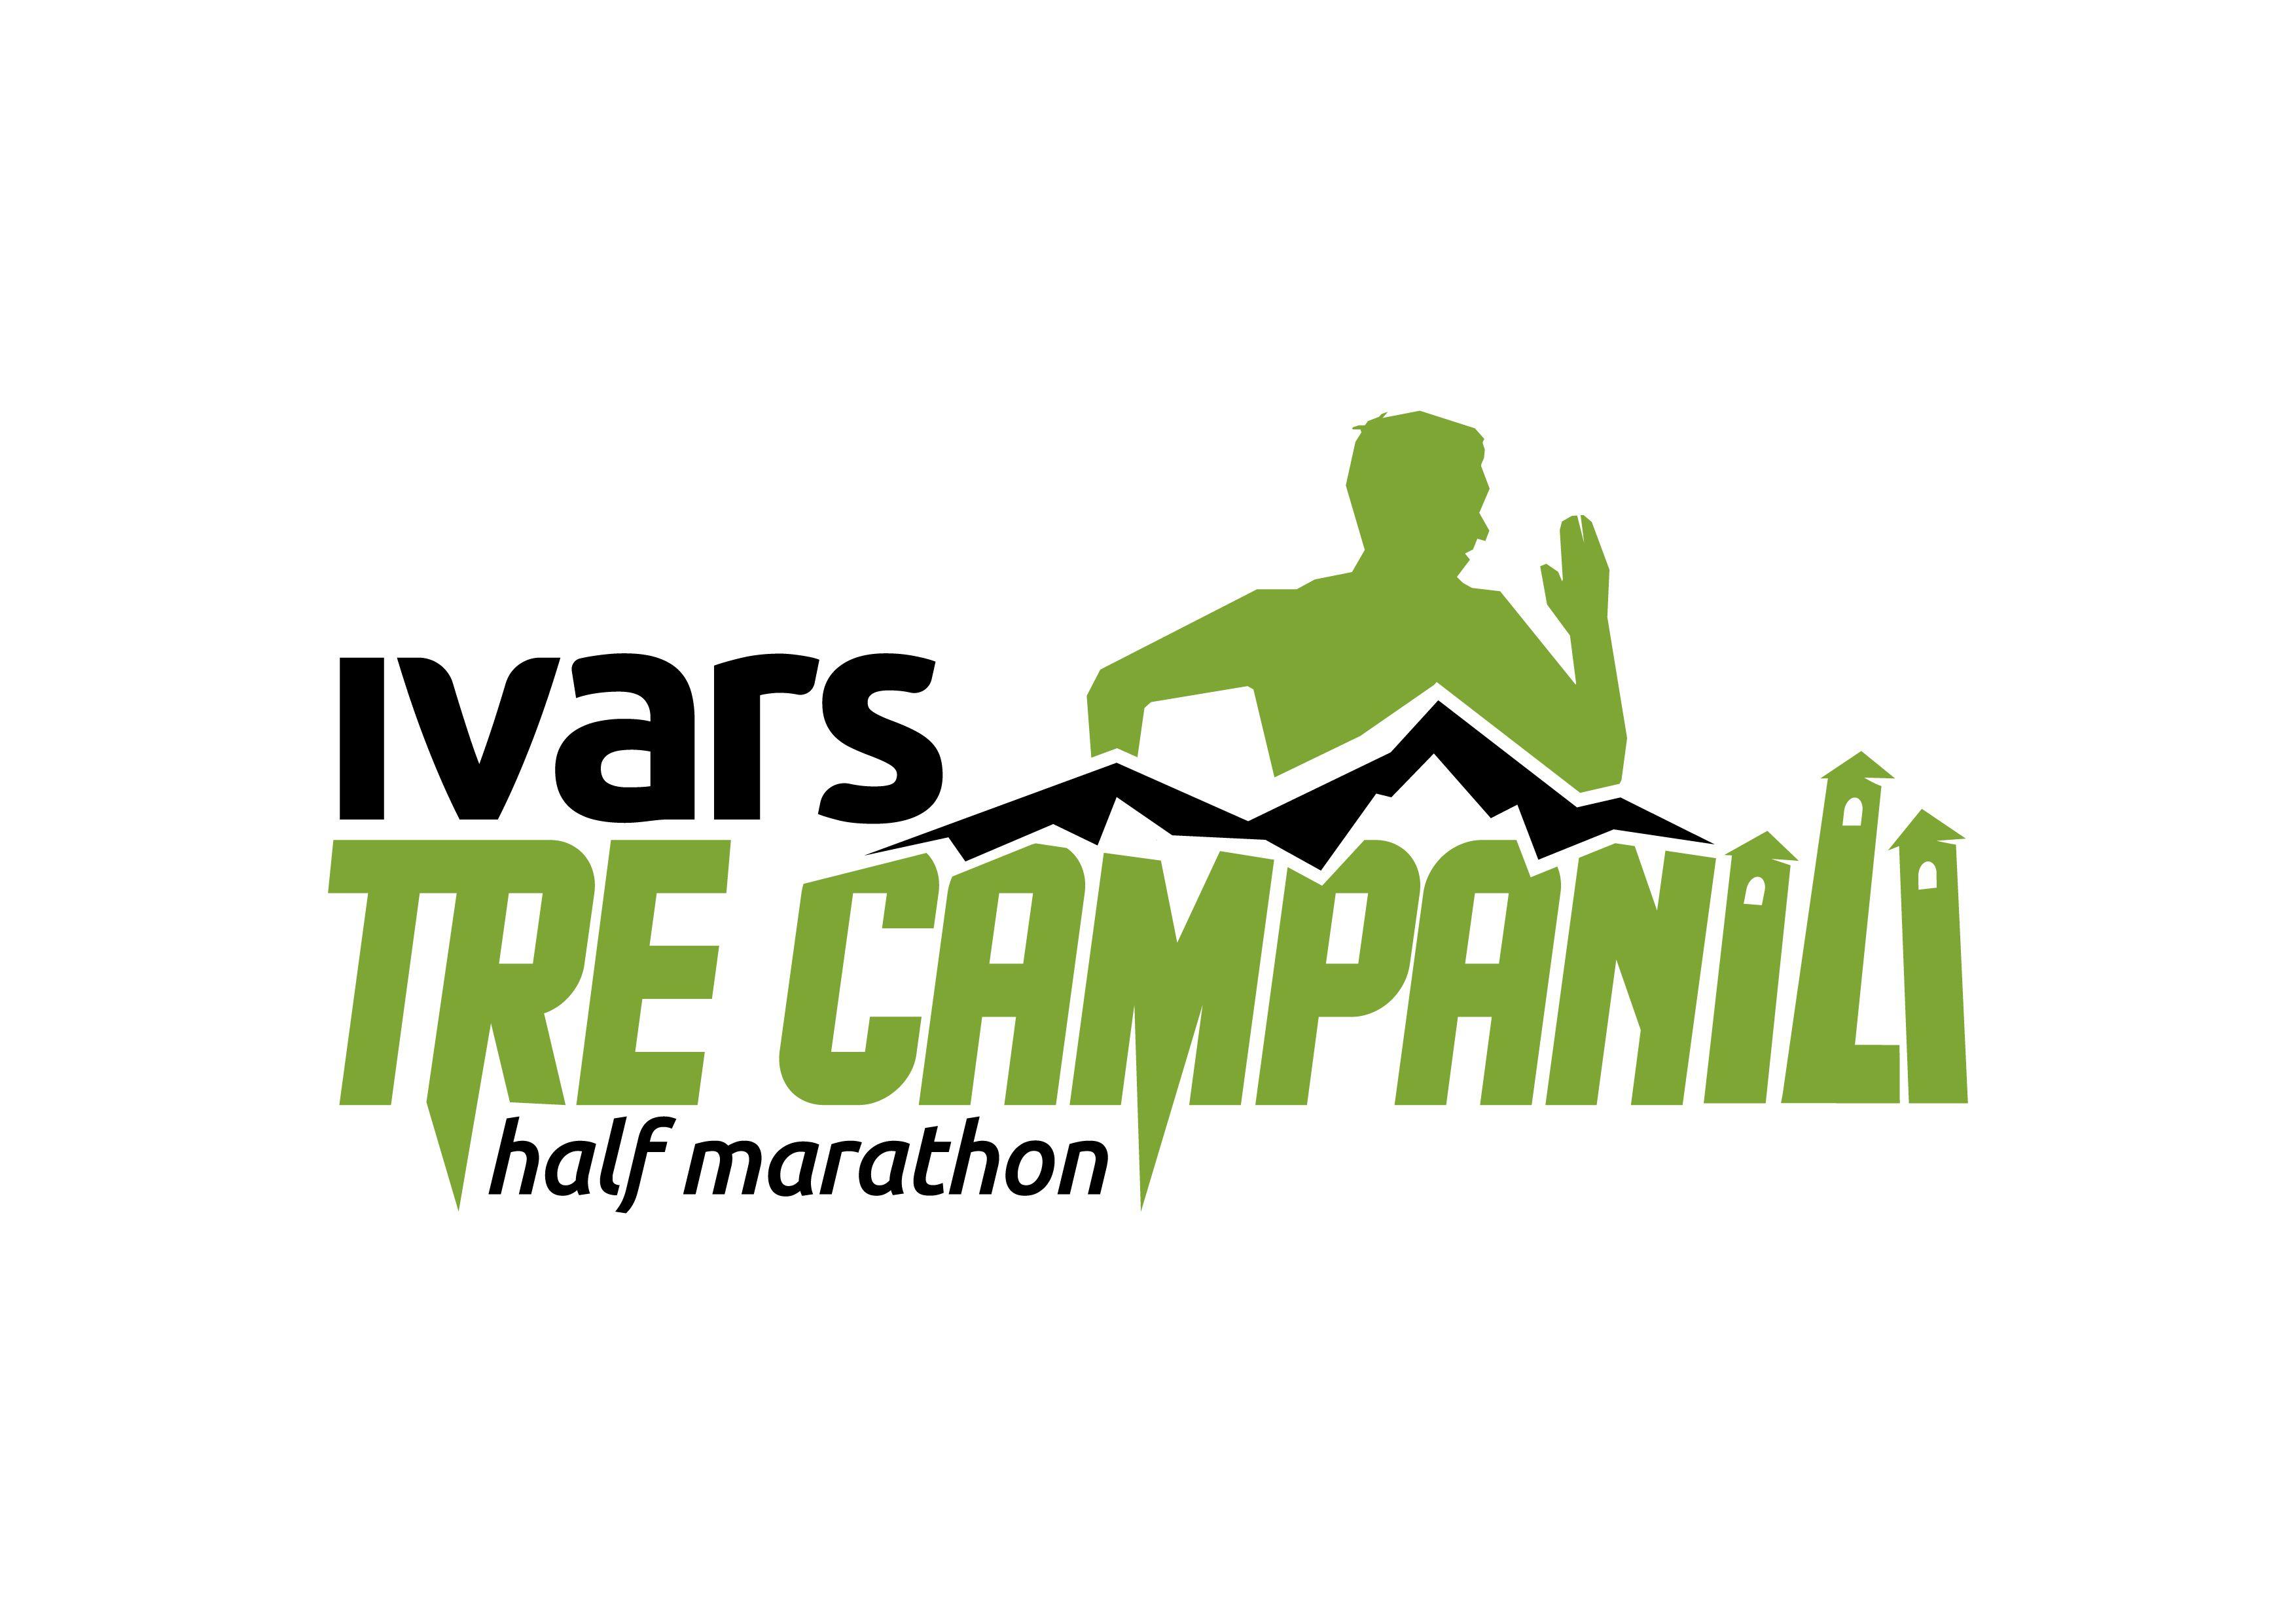 ivars-tre-campanili-half-marathon-si-rifa-il-look